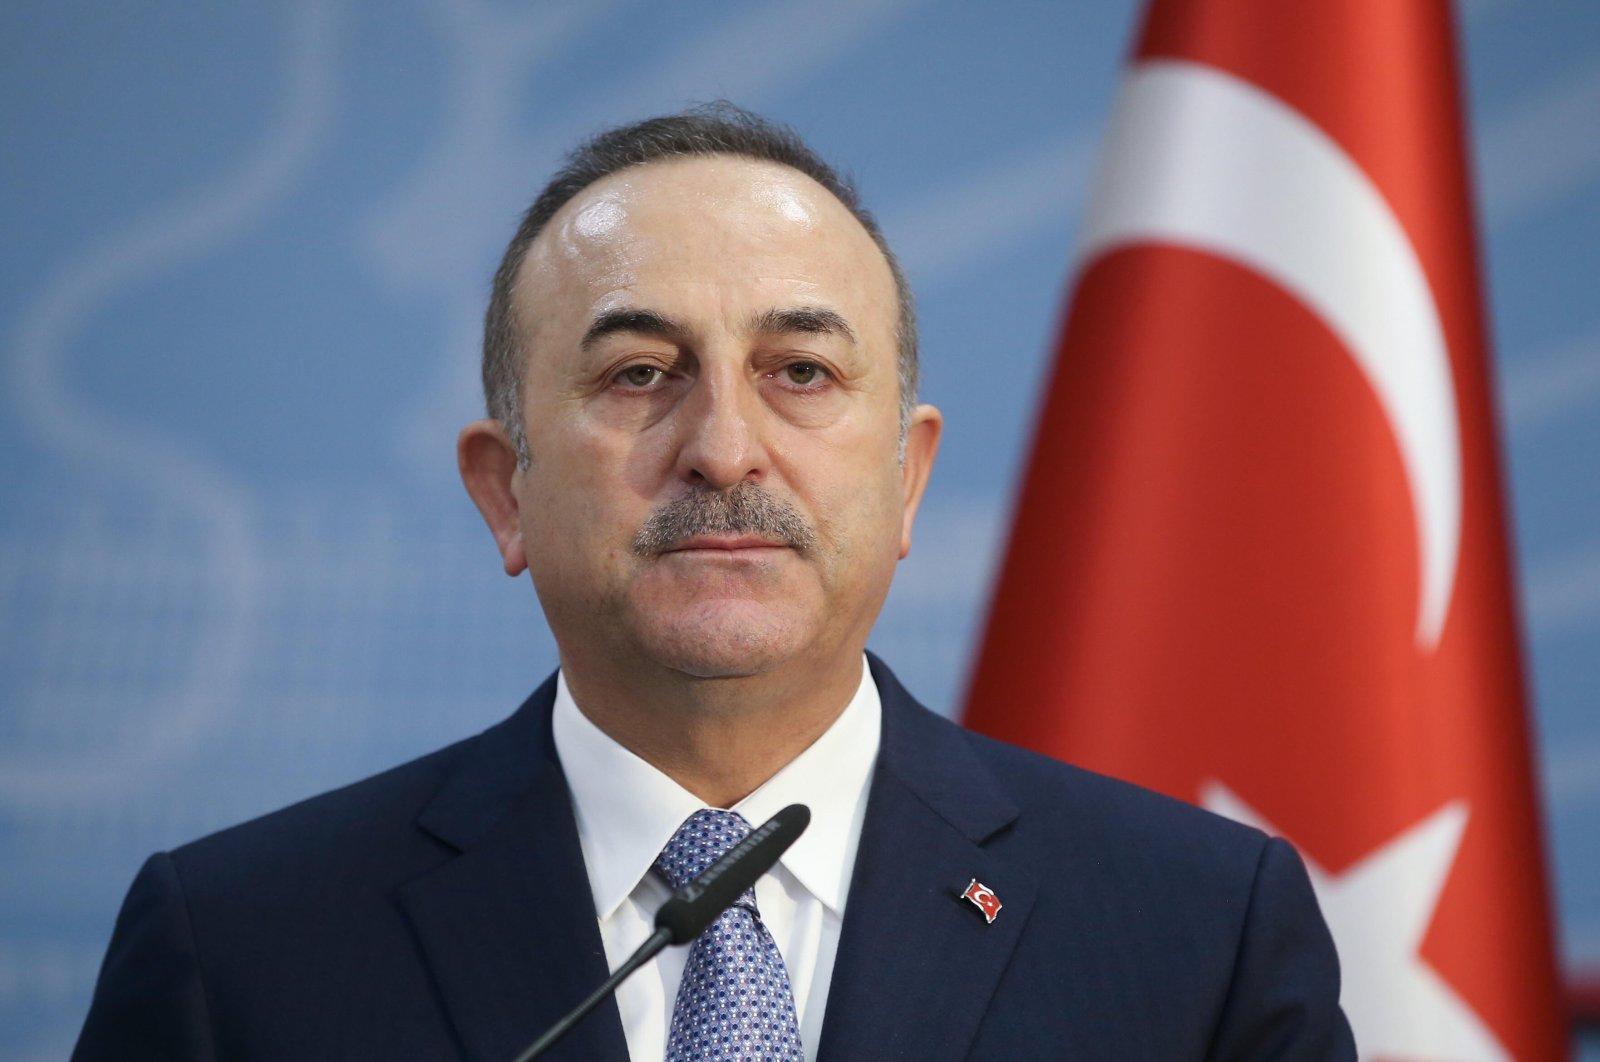 Turkish Foreign Minister Mevlüt Çavuşoğlu in seen in this undated photo. (AA Photo)